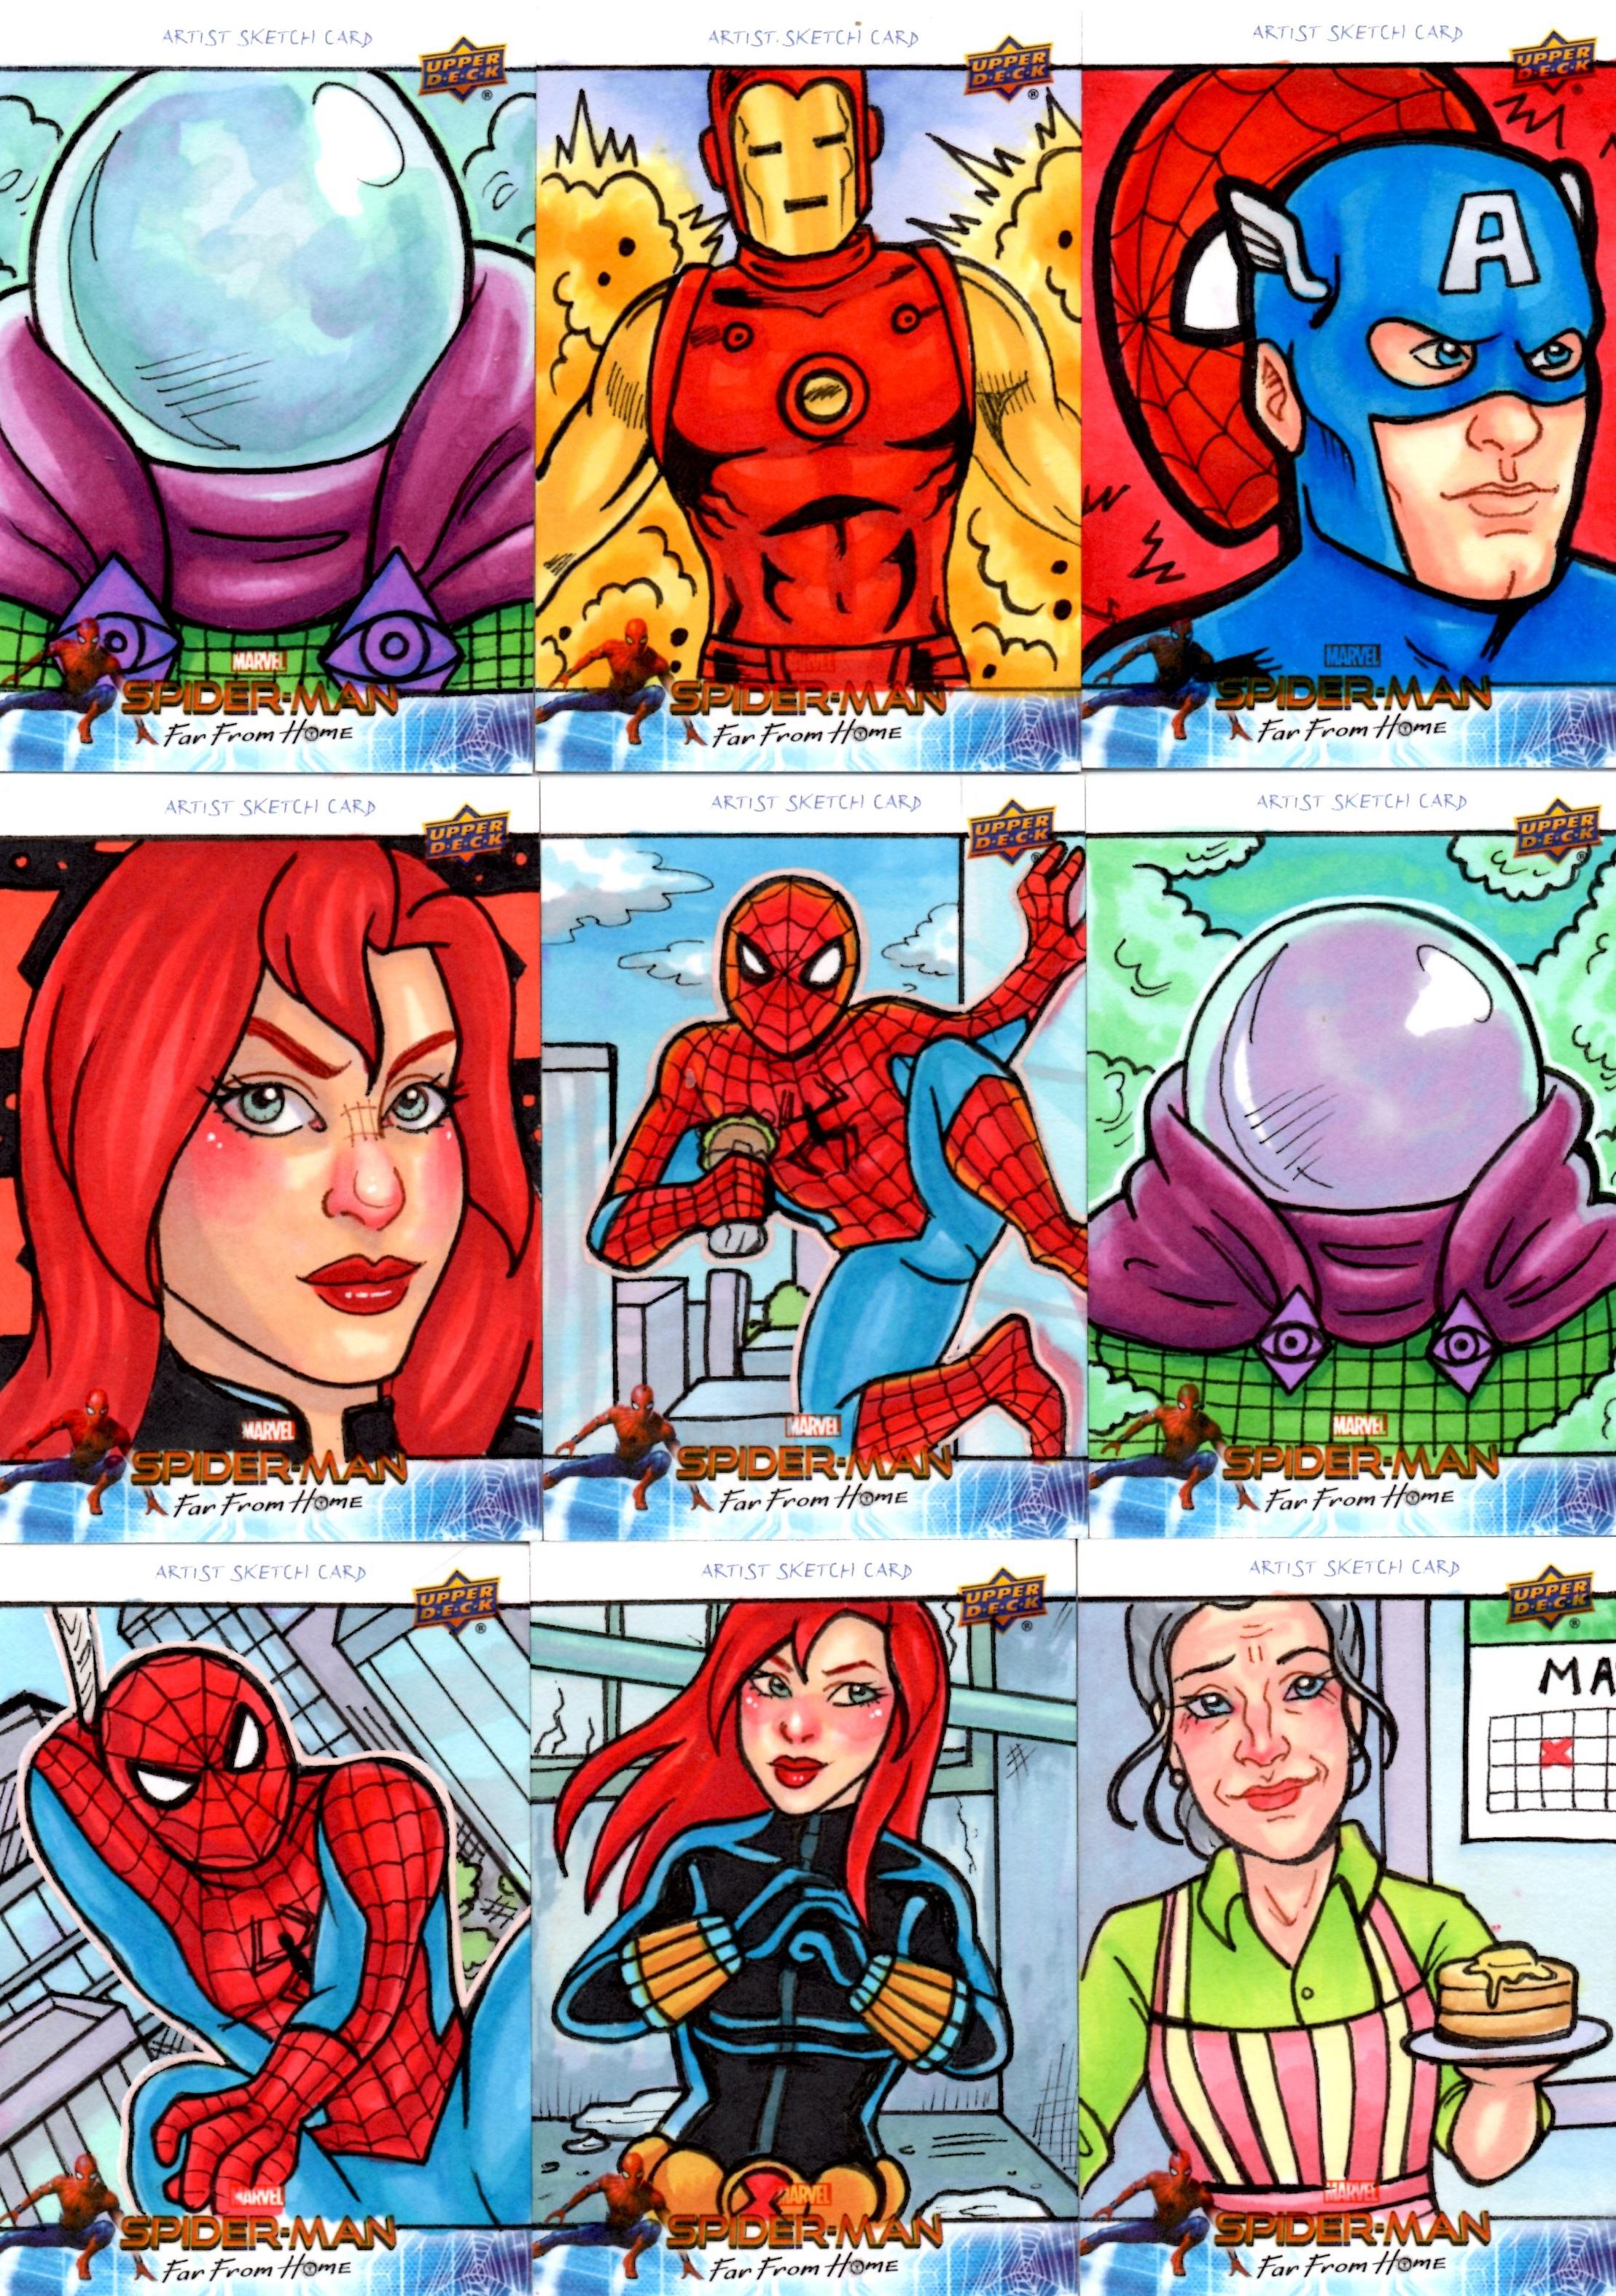 Spiderman FFH - Mai Irving (2)